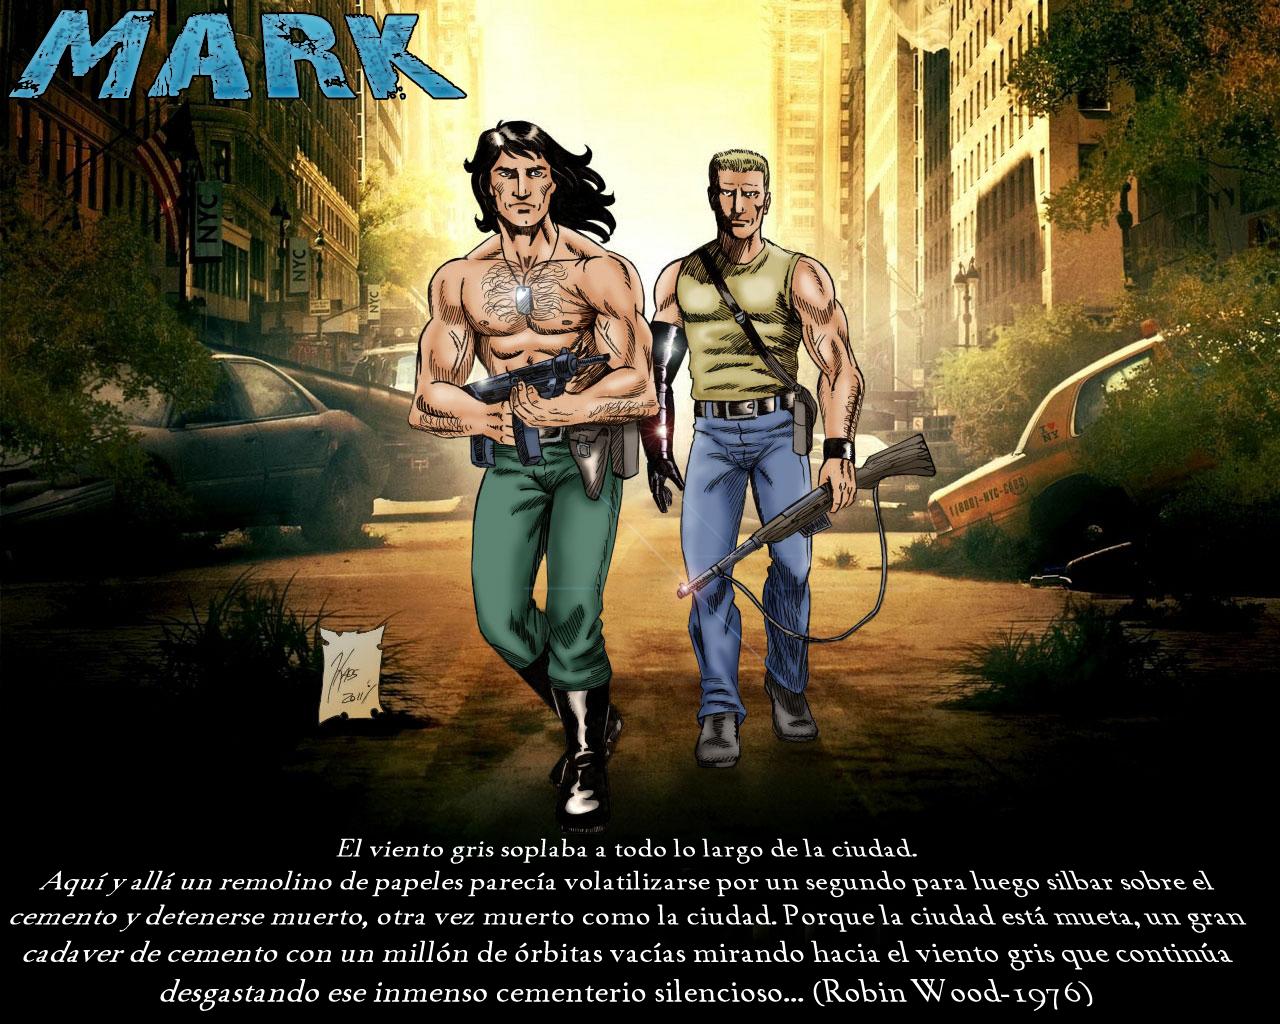 http://2.bp.blogspot.com/-s4ImsDWxLlo/T2piHRPQGsI/AAAAAAAAB5k/W91Y-xg6E-E/s1600/Mark_Soy_leyenda.jpg